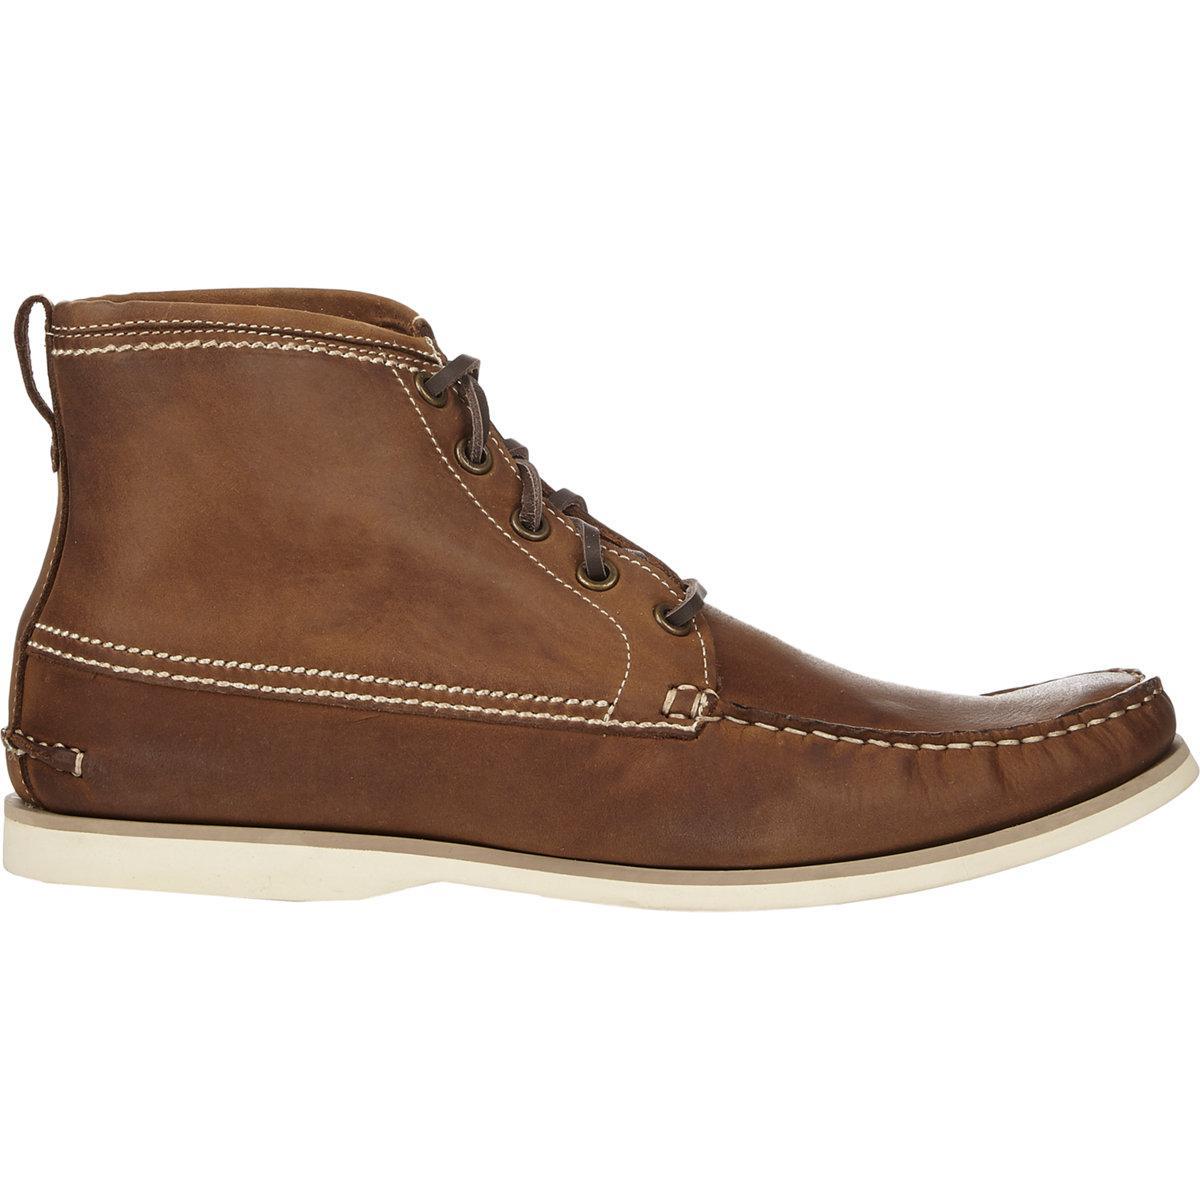 John Varvatos Star Clipper Boots In Brown For Men Lyst